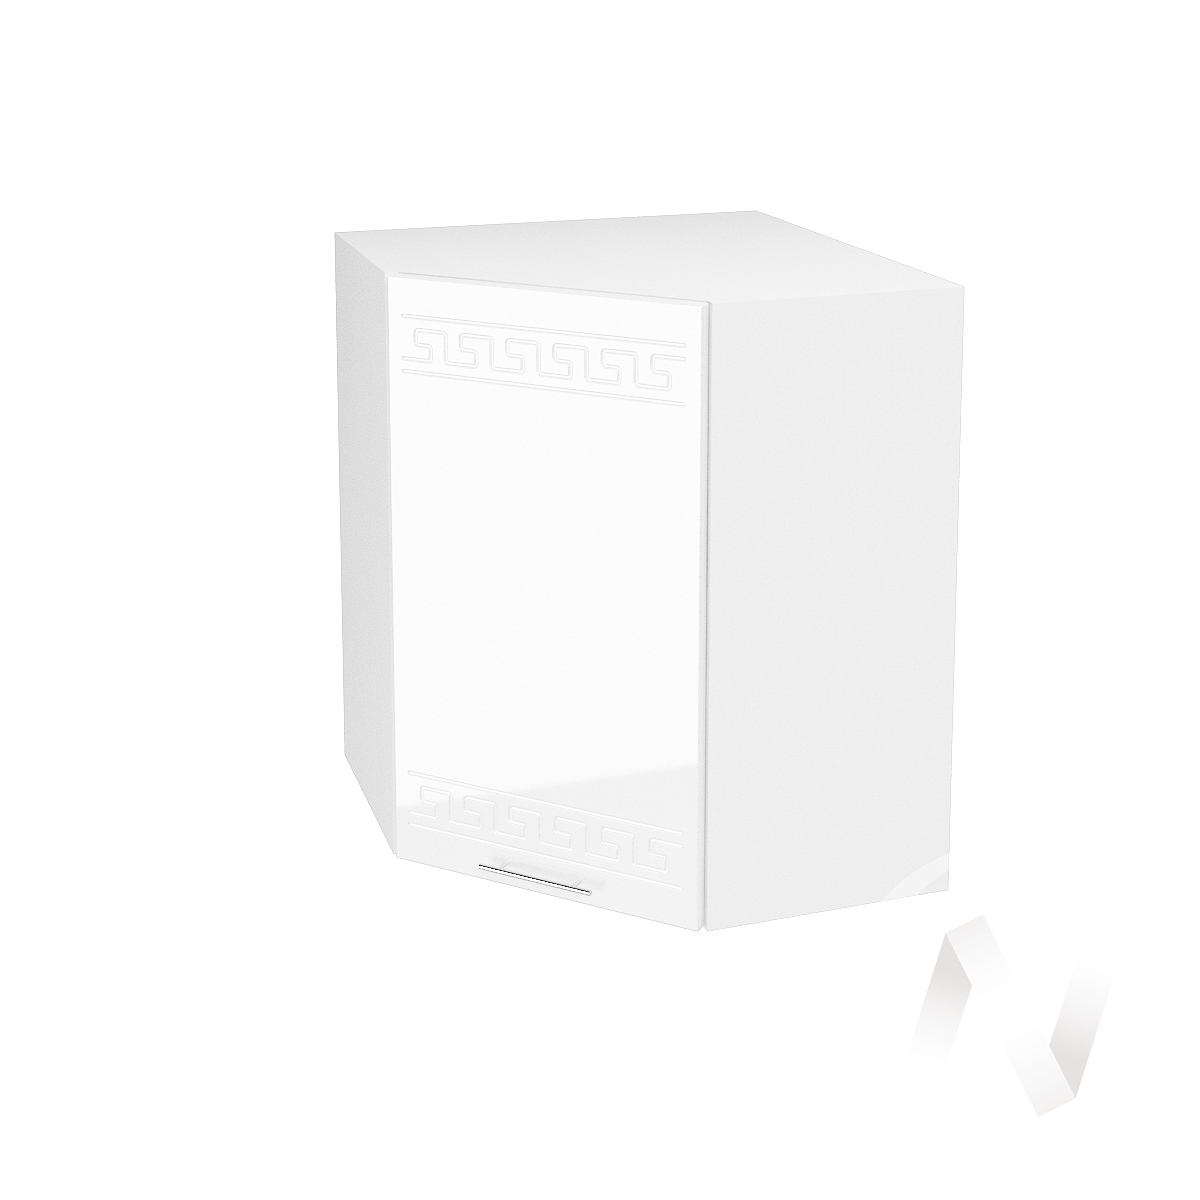 "Кухня ""Греция"": Шкаф верхний угловой 590, ШВУ 590 (белый металлик/корпус белый)"